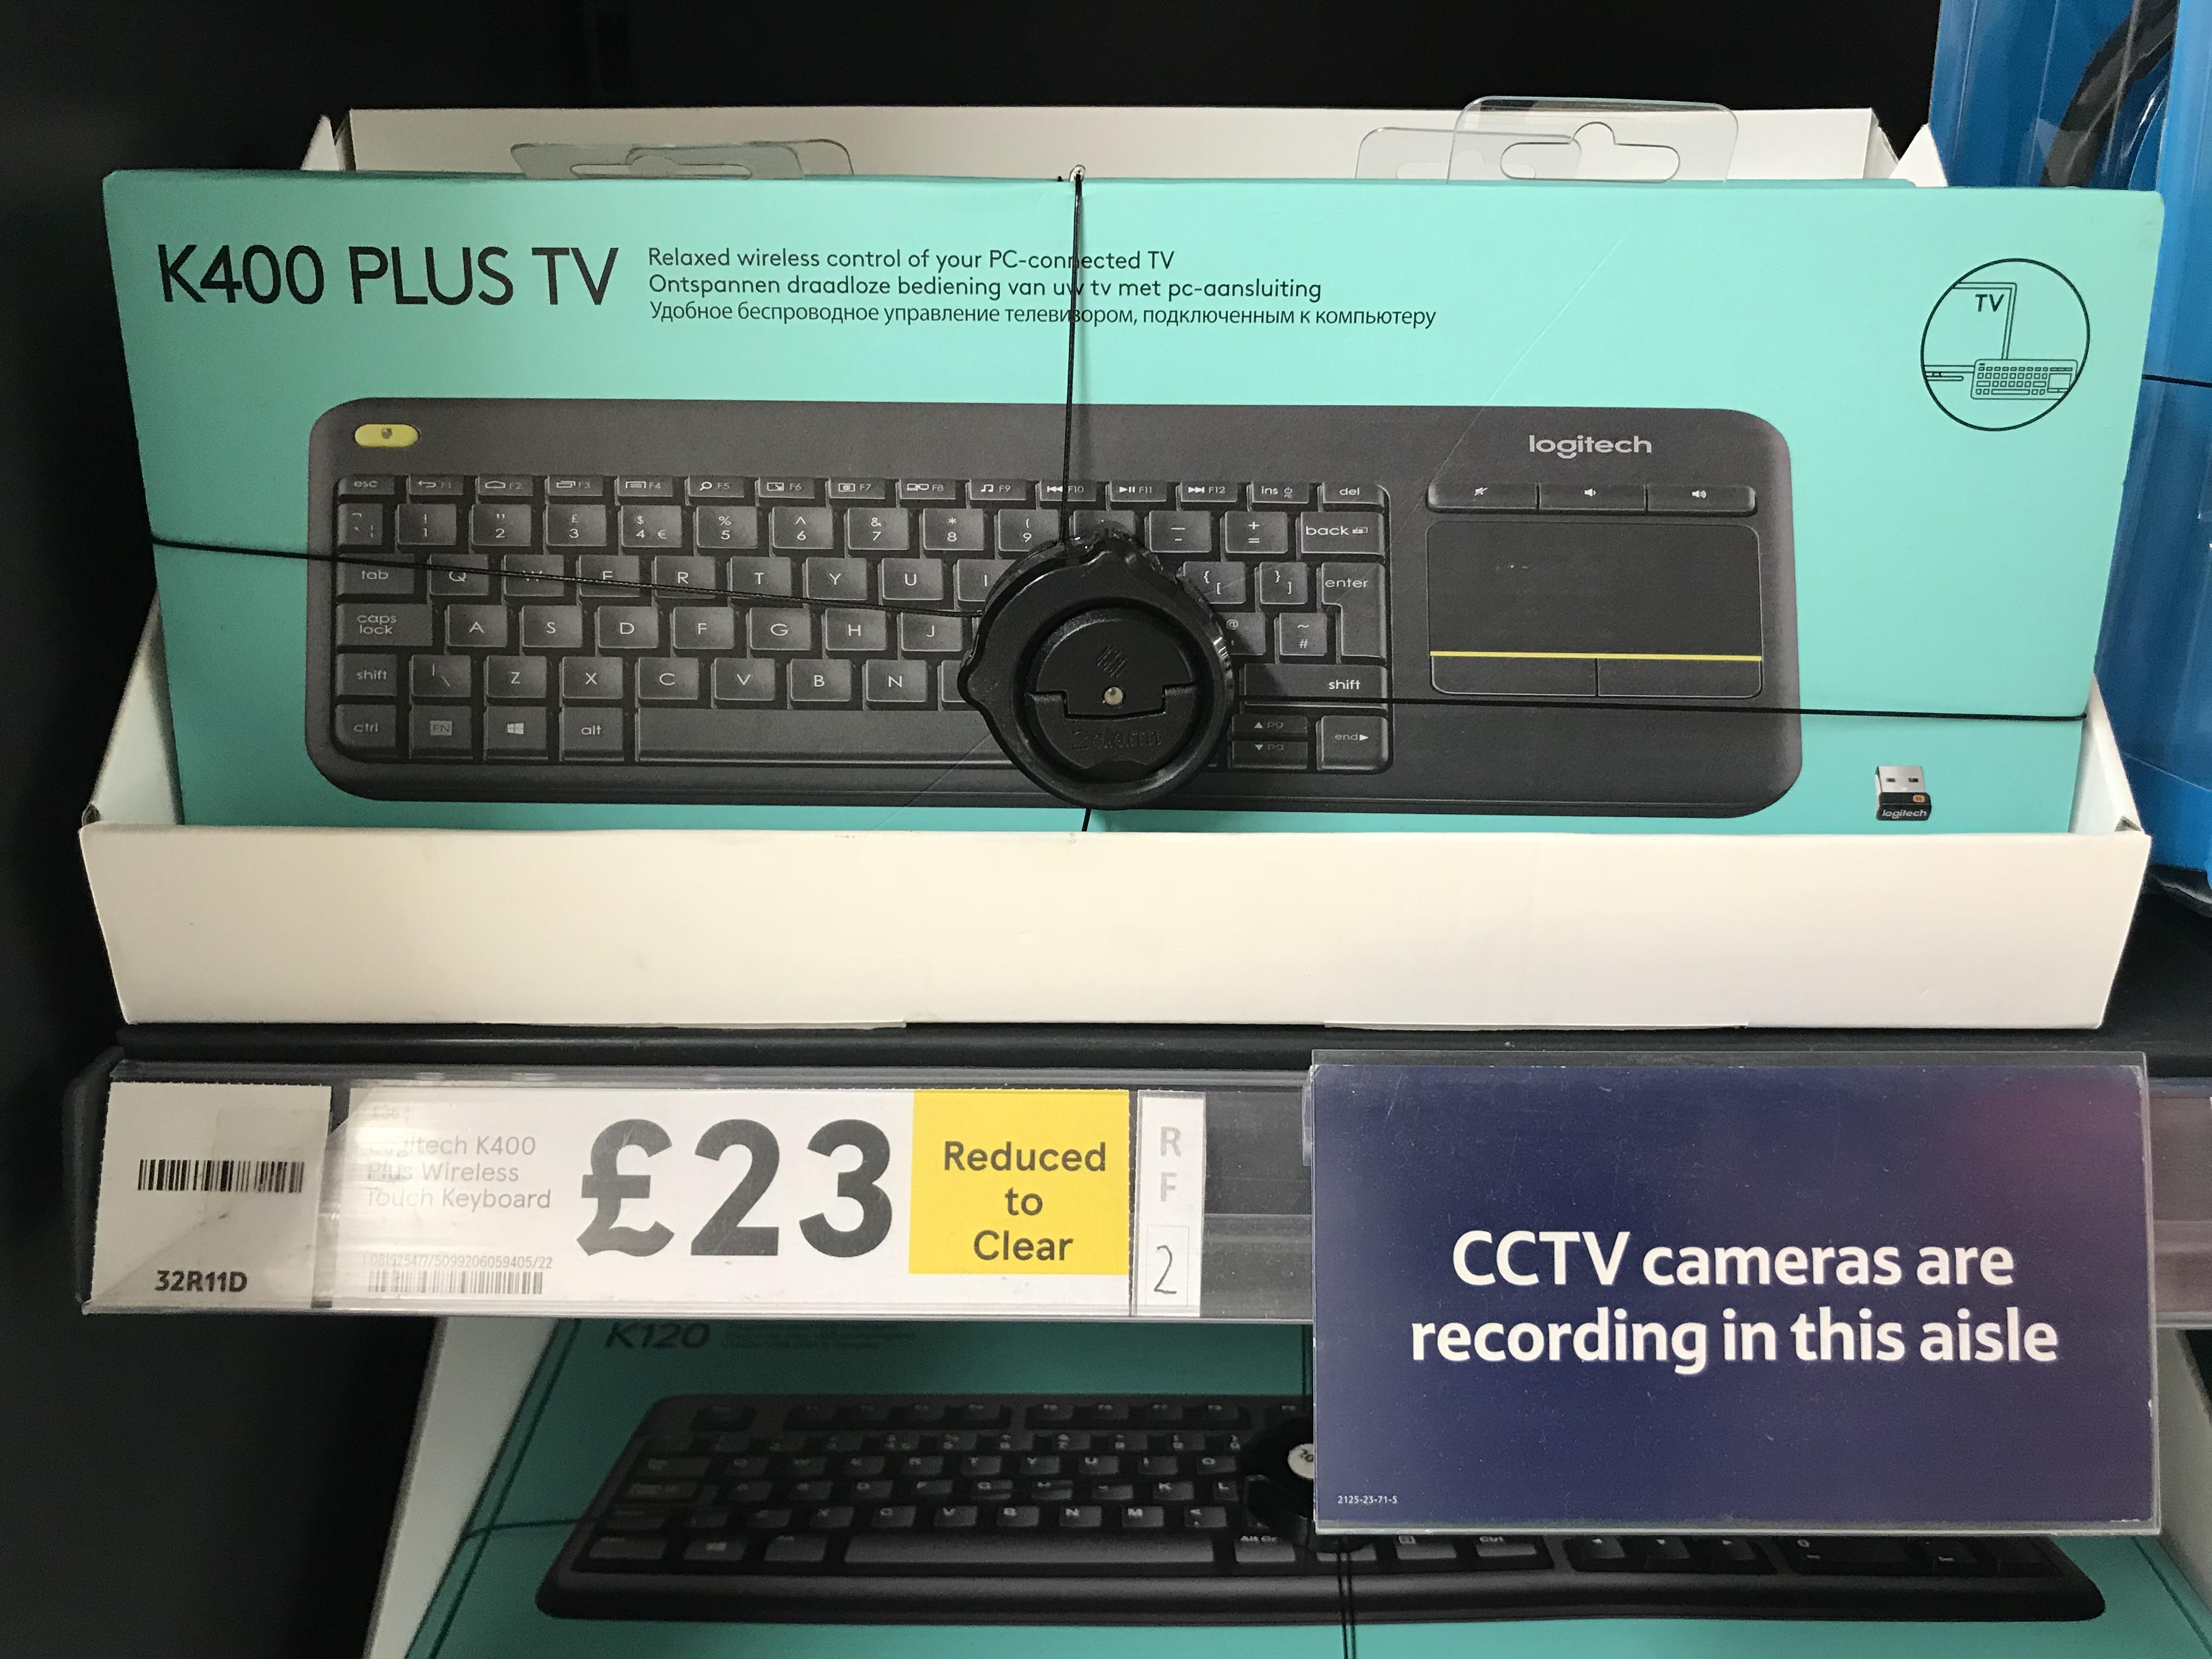 Logitech K400 Plus TV £23 @ Tesco extra Redruth